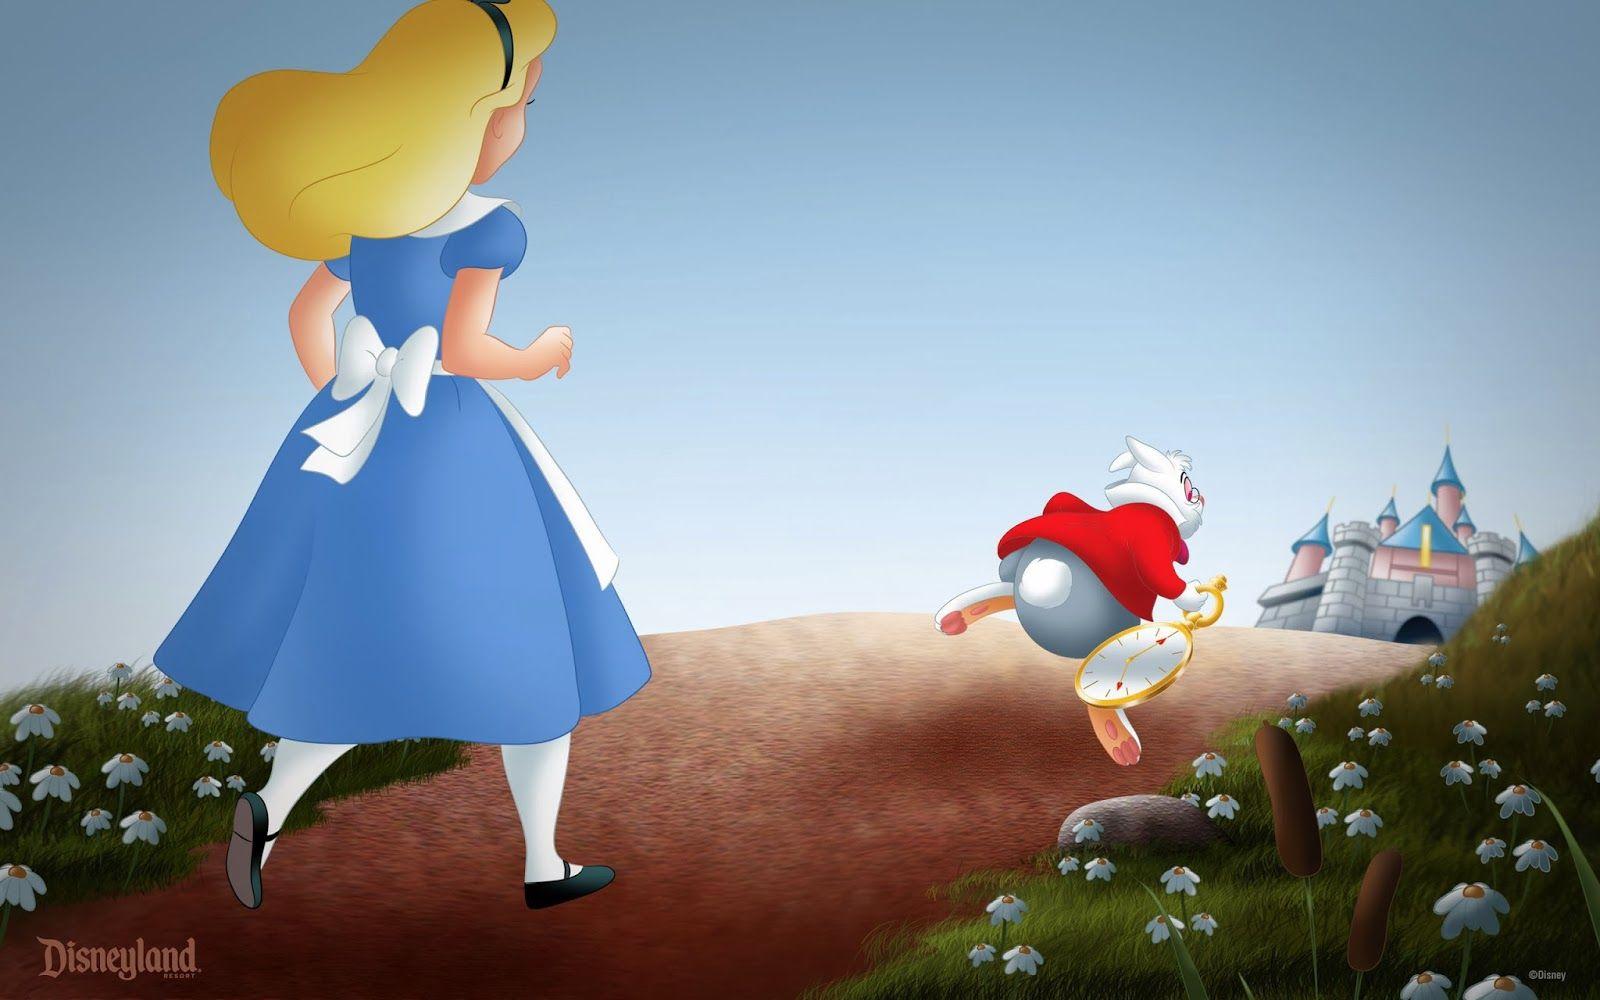 Alice In Wonderland Cartoon Alice In Wonderland Hd Wallpapers Alice In Wonderland Disney Alice In Wonderland Disney Wallpaper